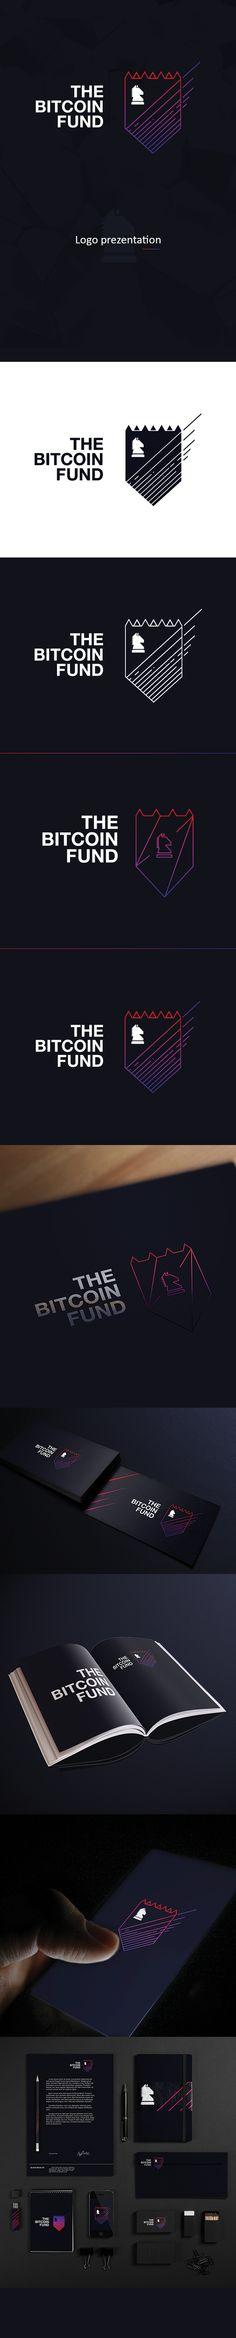 TBF logo 3 by Elastika, via Behance